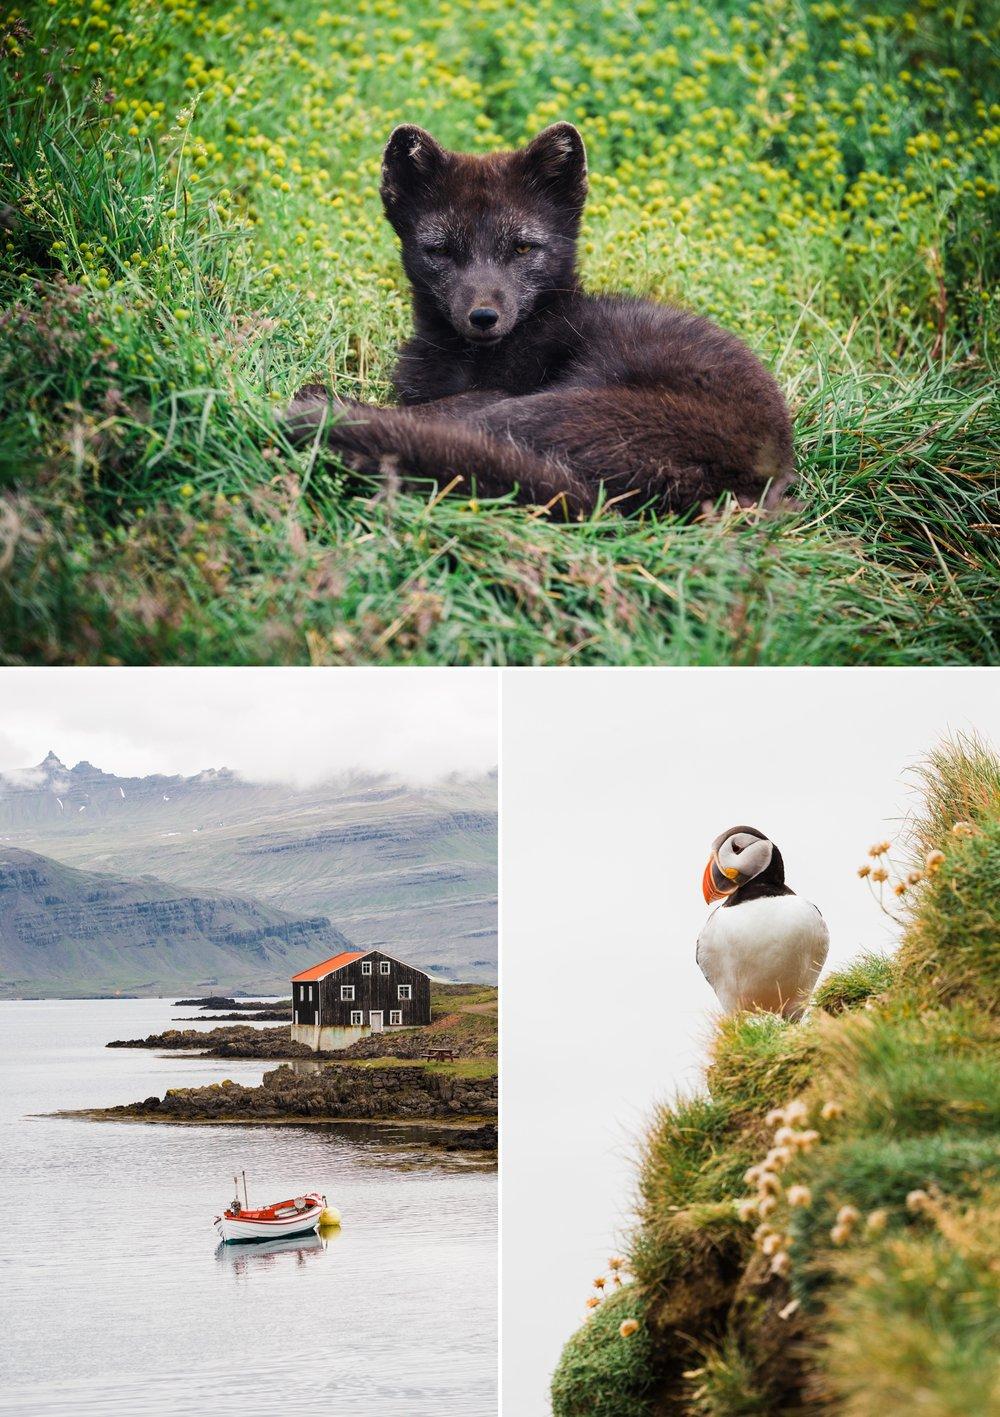 8-iceland-wildlife-arctic-fox-puffin.jpg